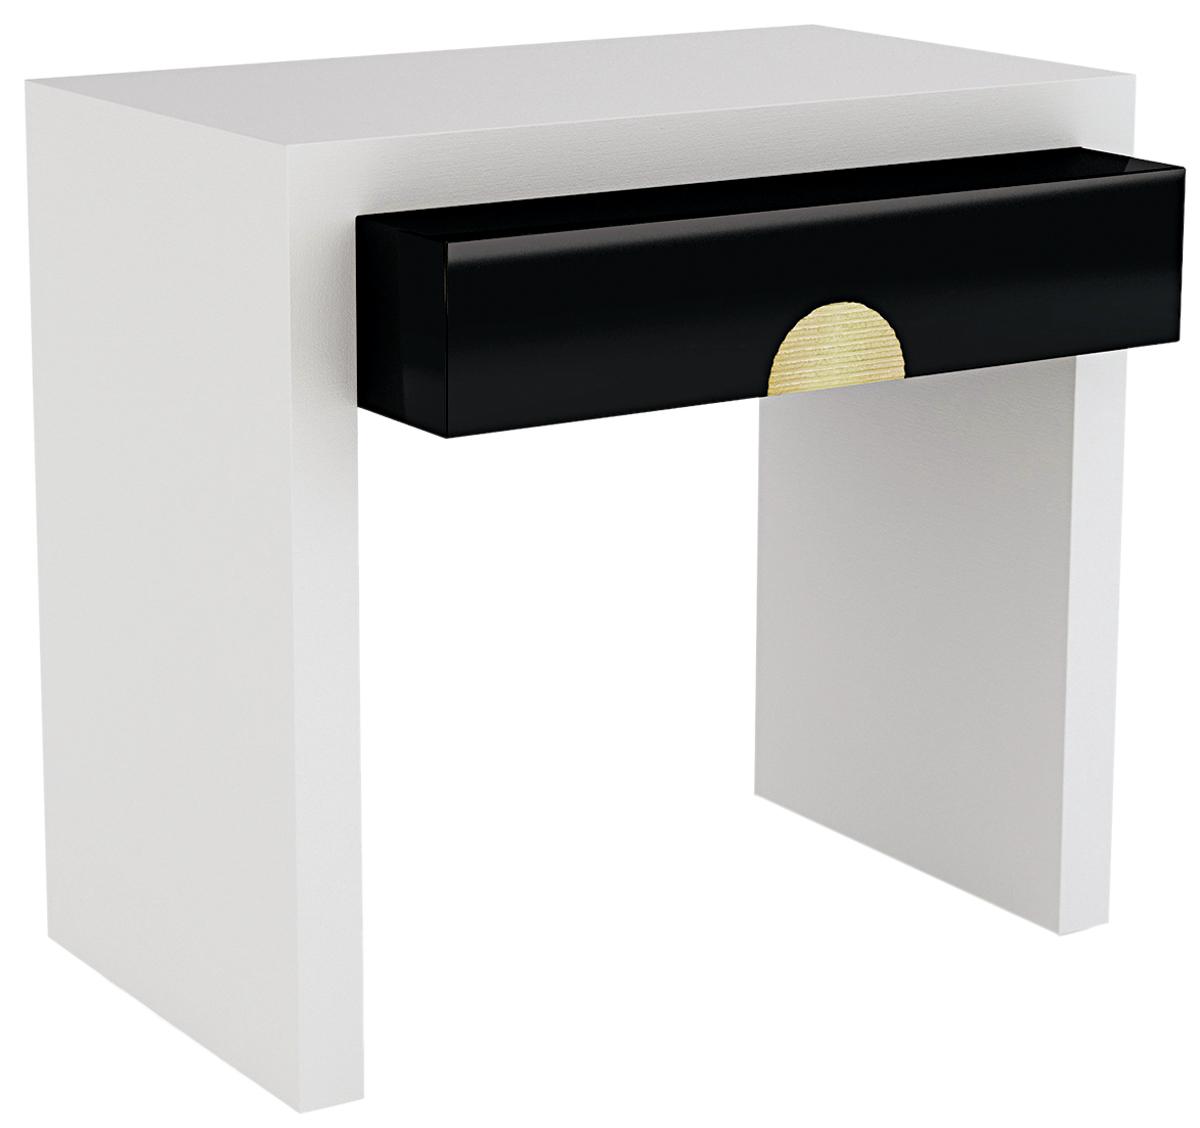 black-white-red-furniture-accessories-11